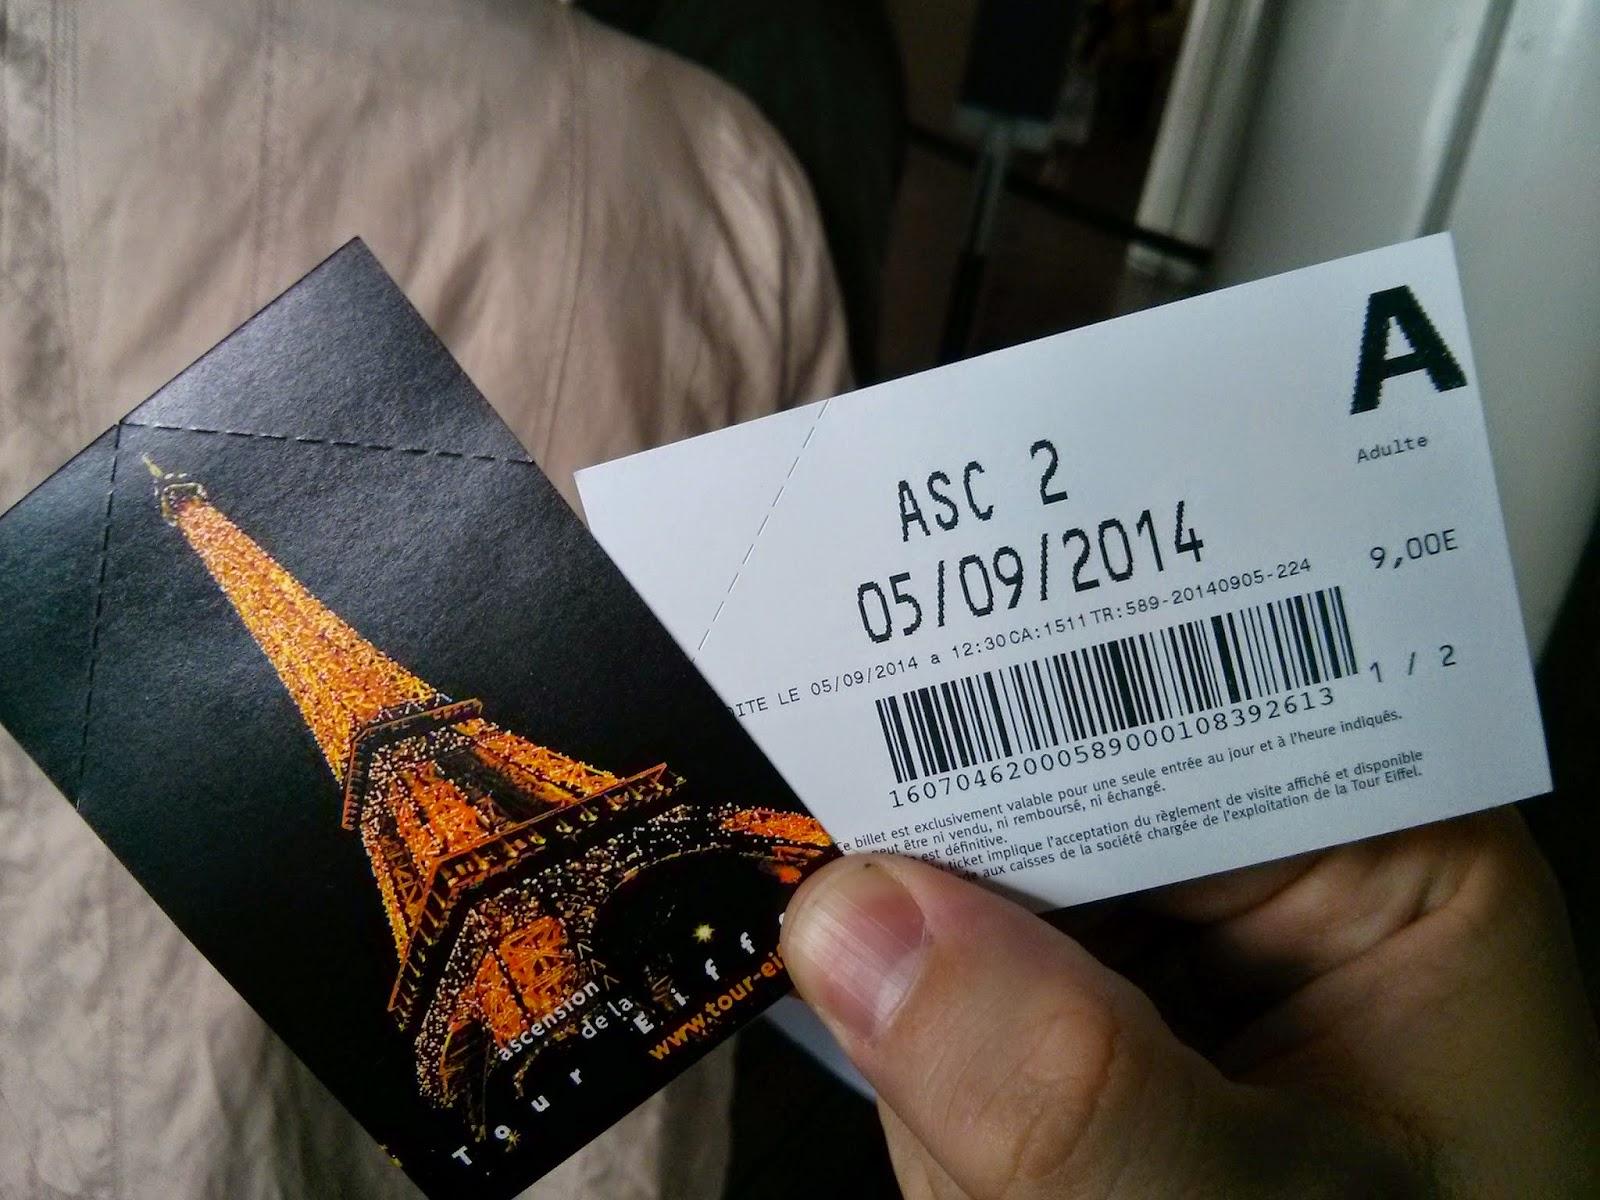 VipandSmart Torre Eiffel tickets